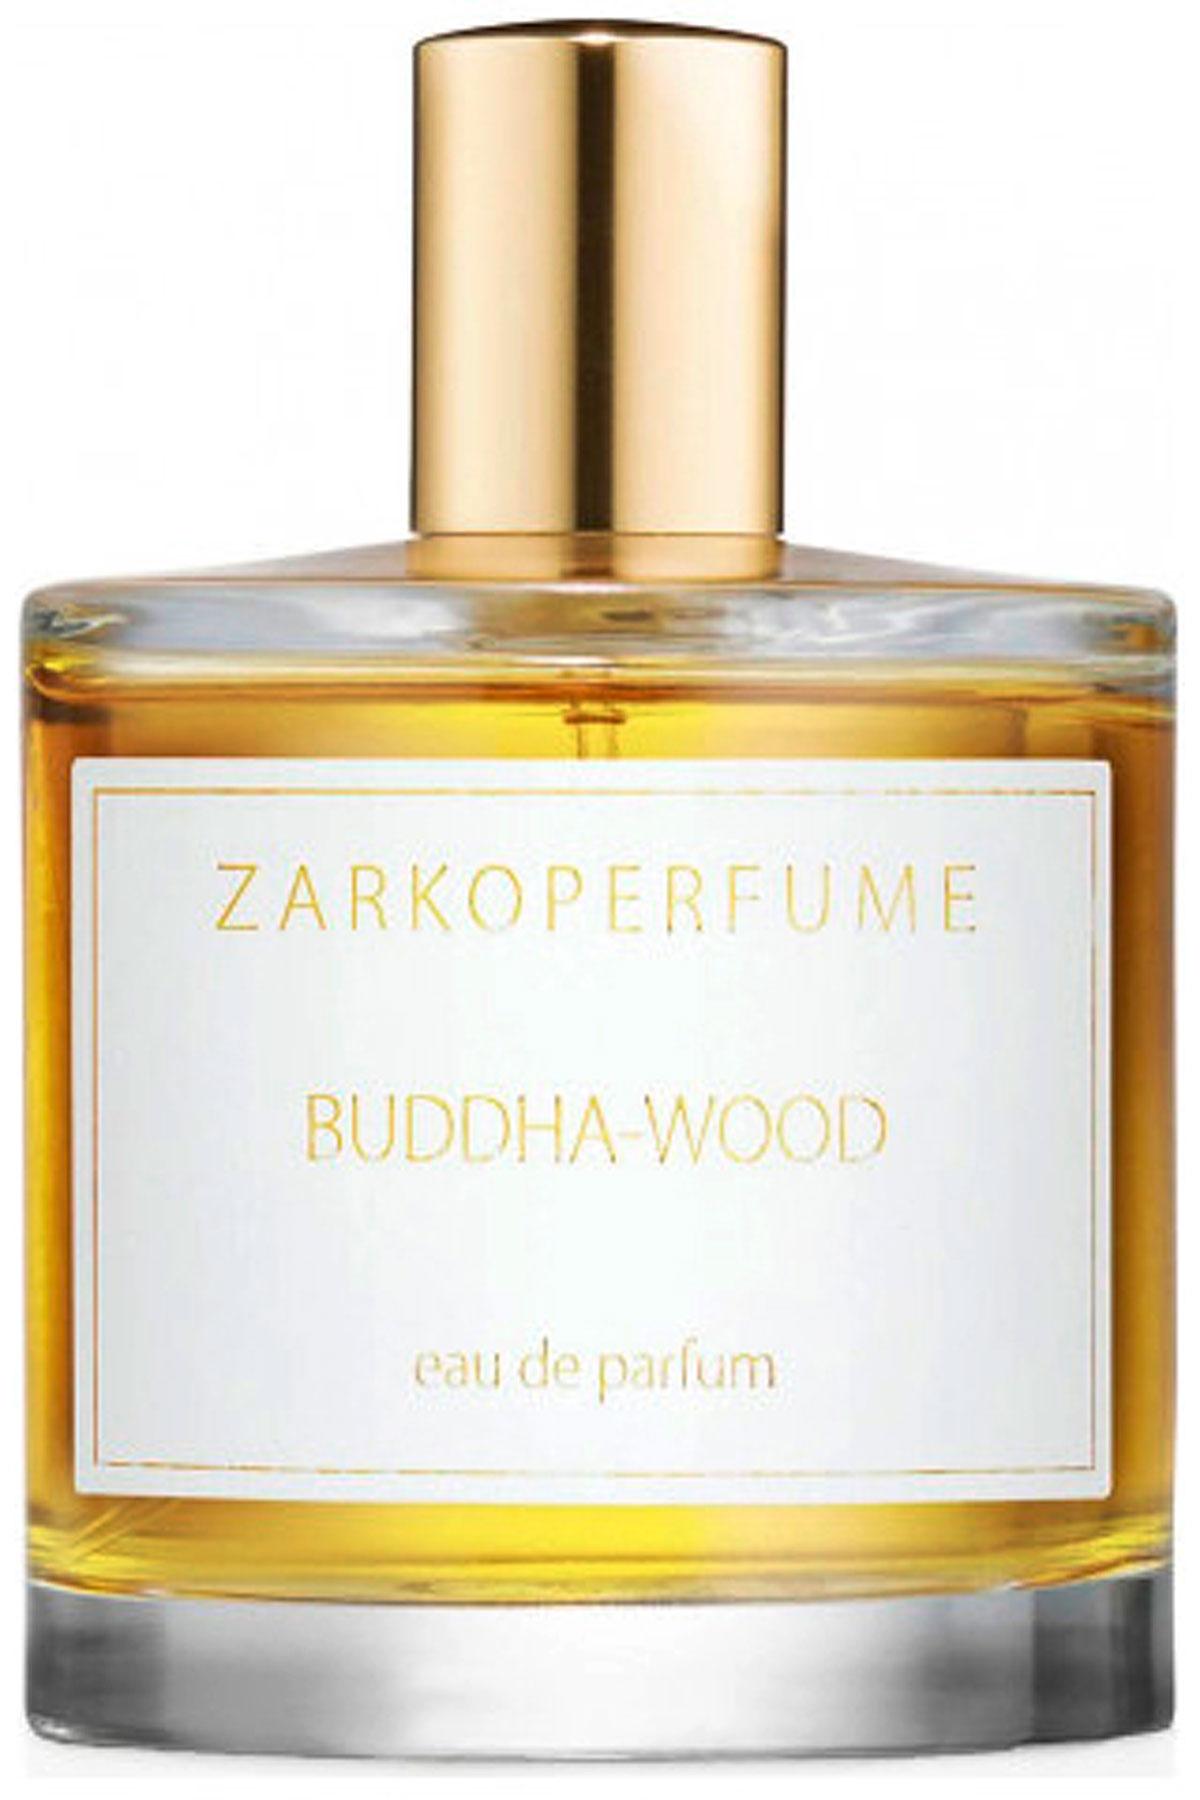 Zarkoperfume Fragrances for Men, Buddha Wood - Eau De Parfum - 100 Ml, 2019, 100 ml